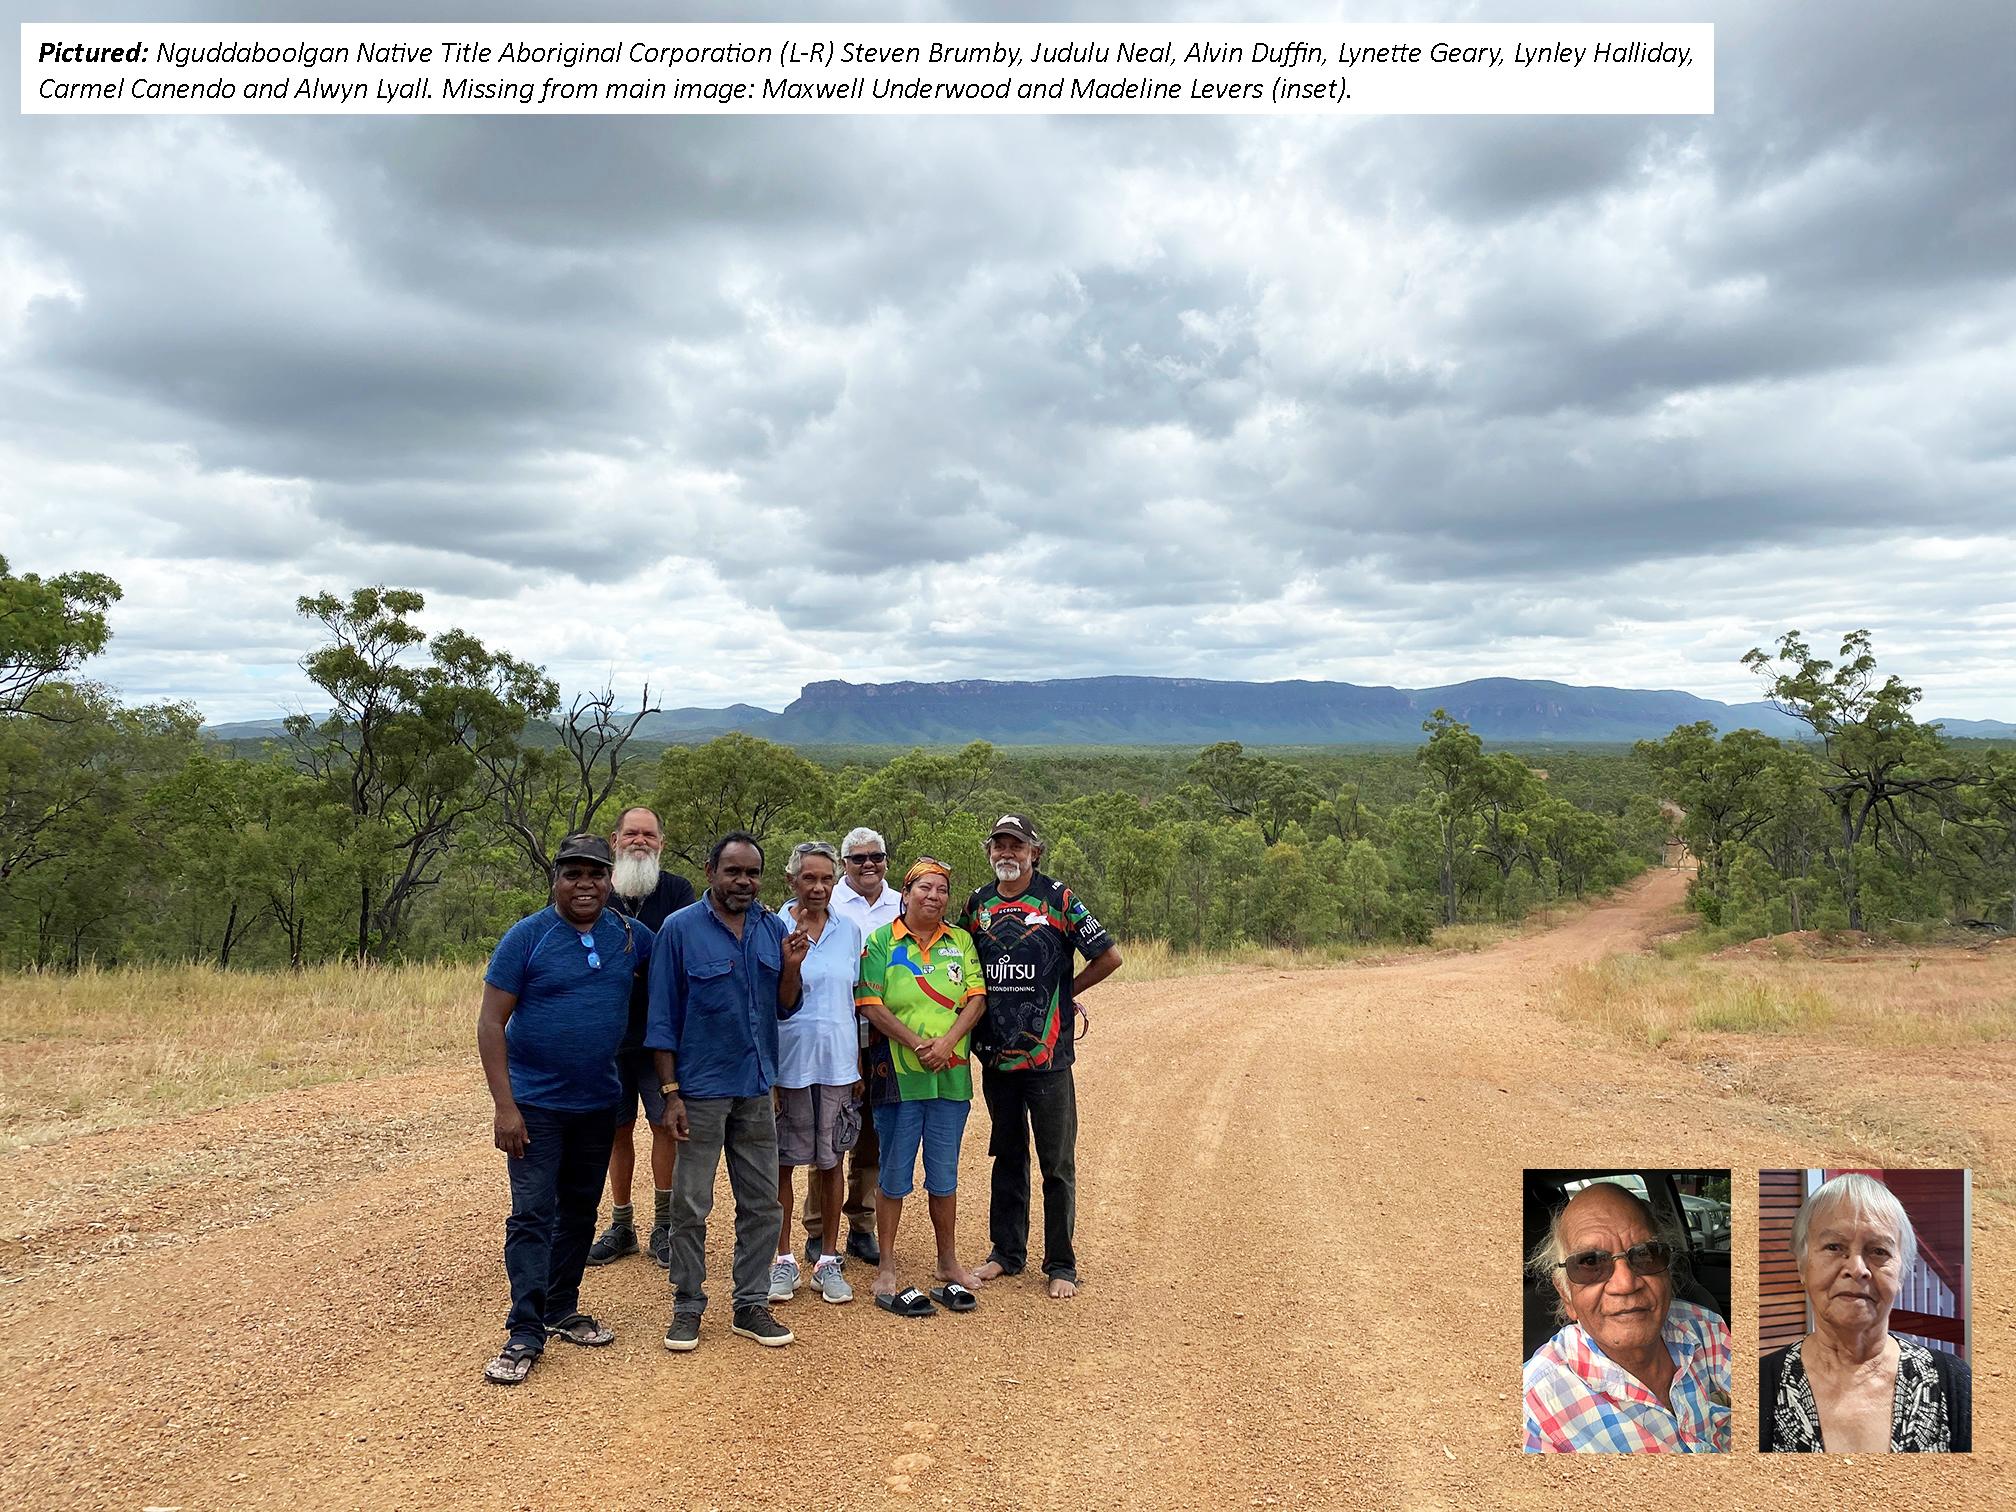 Kondaparinga Station Trip – NNTAC, NQLC & ILSC (27-28 April 2021)